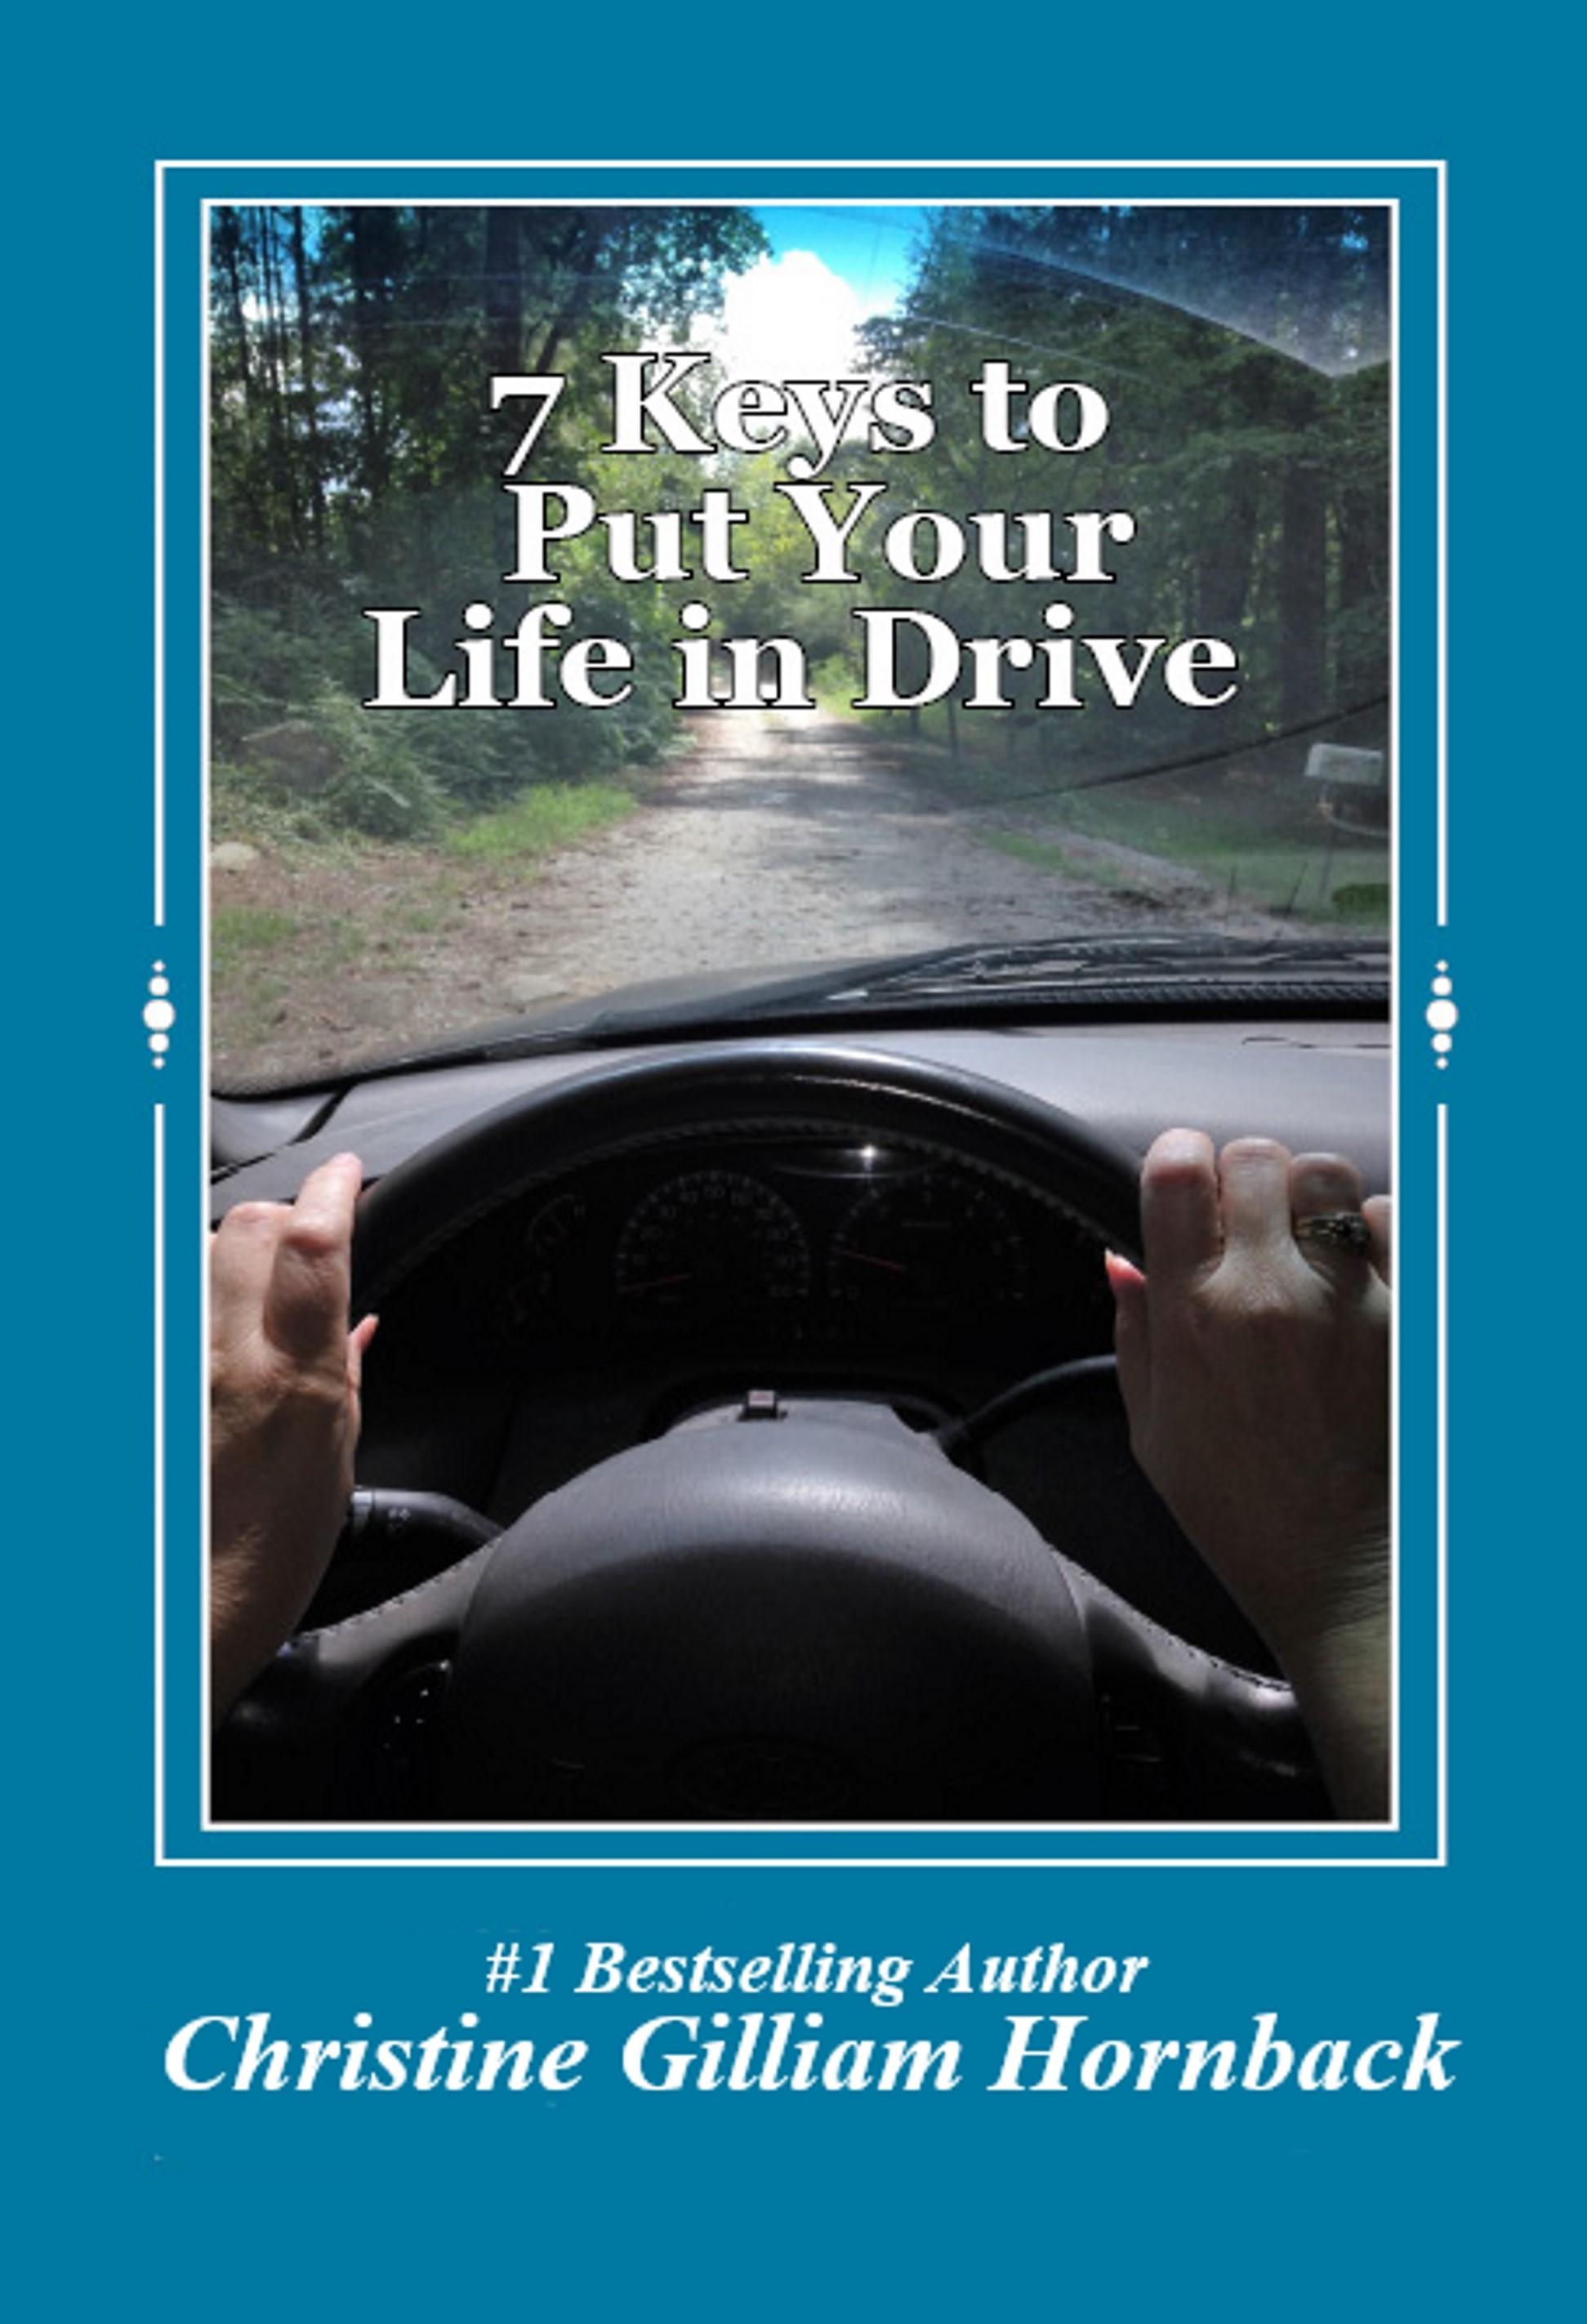 7 keys BookCover final front cover - Copy - Copy